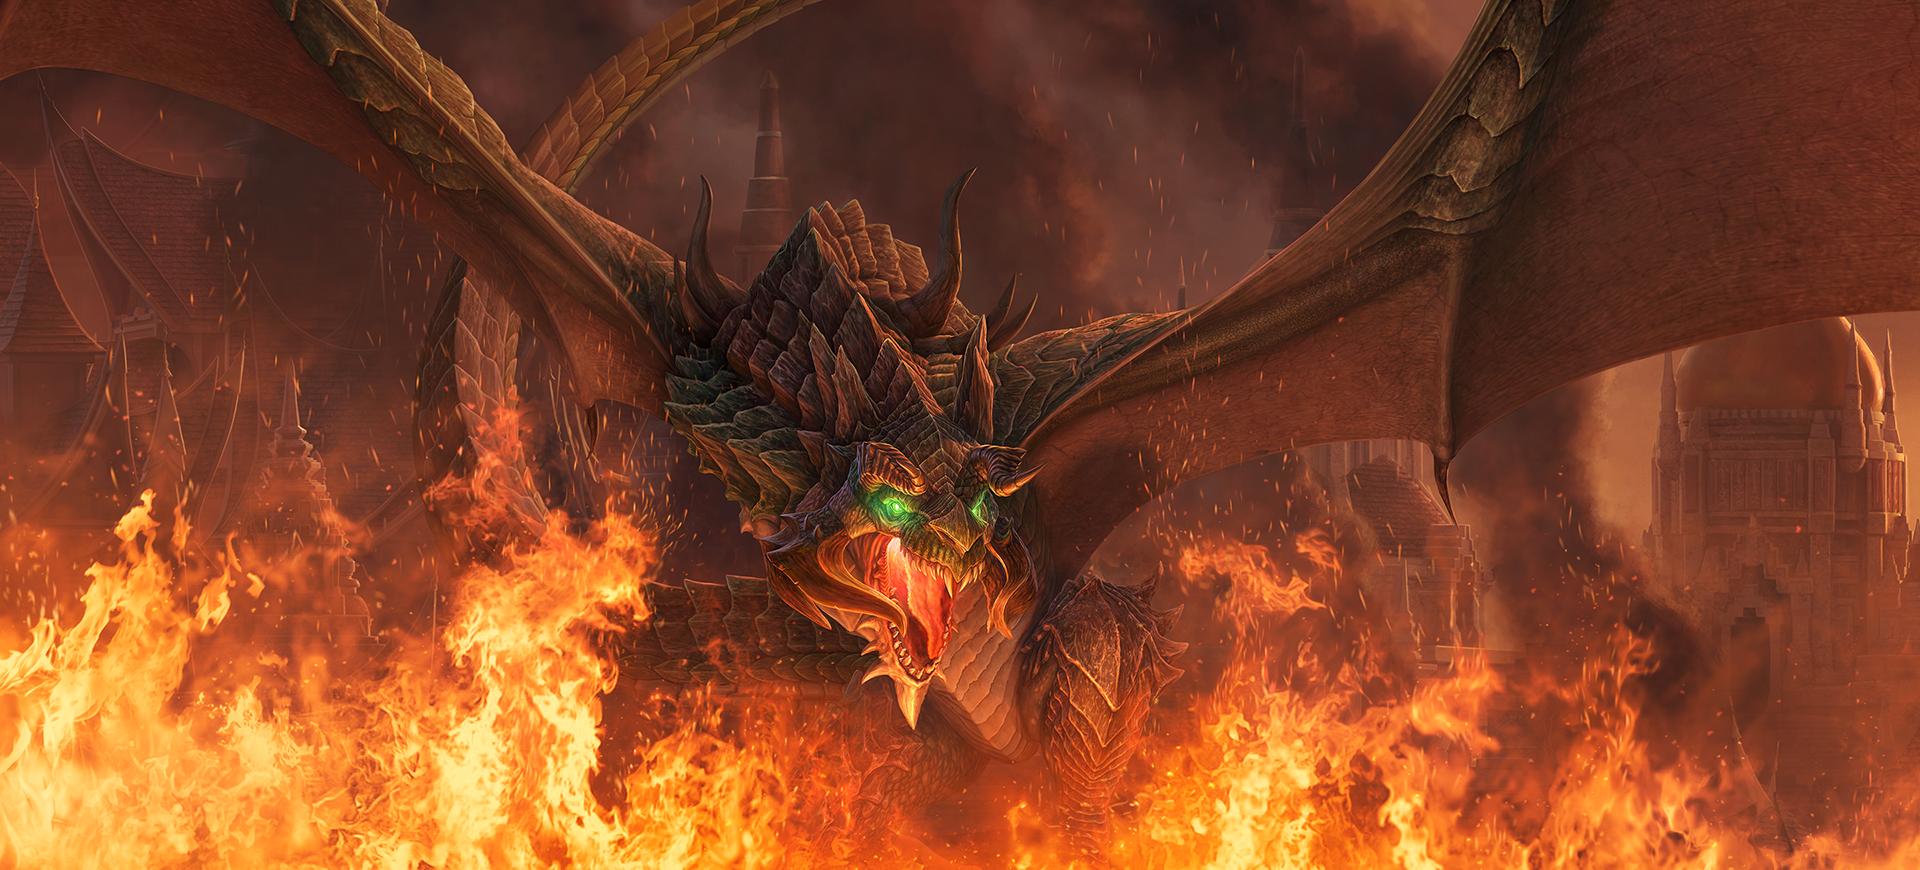 The Elder Scrolls Online Celebrates The Elder Scrolls' 25th